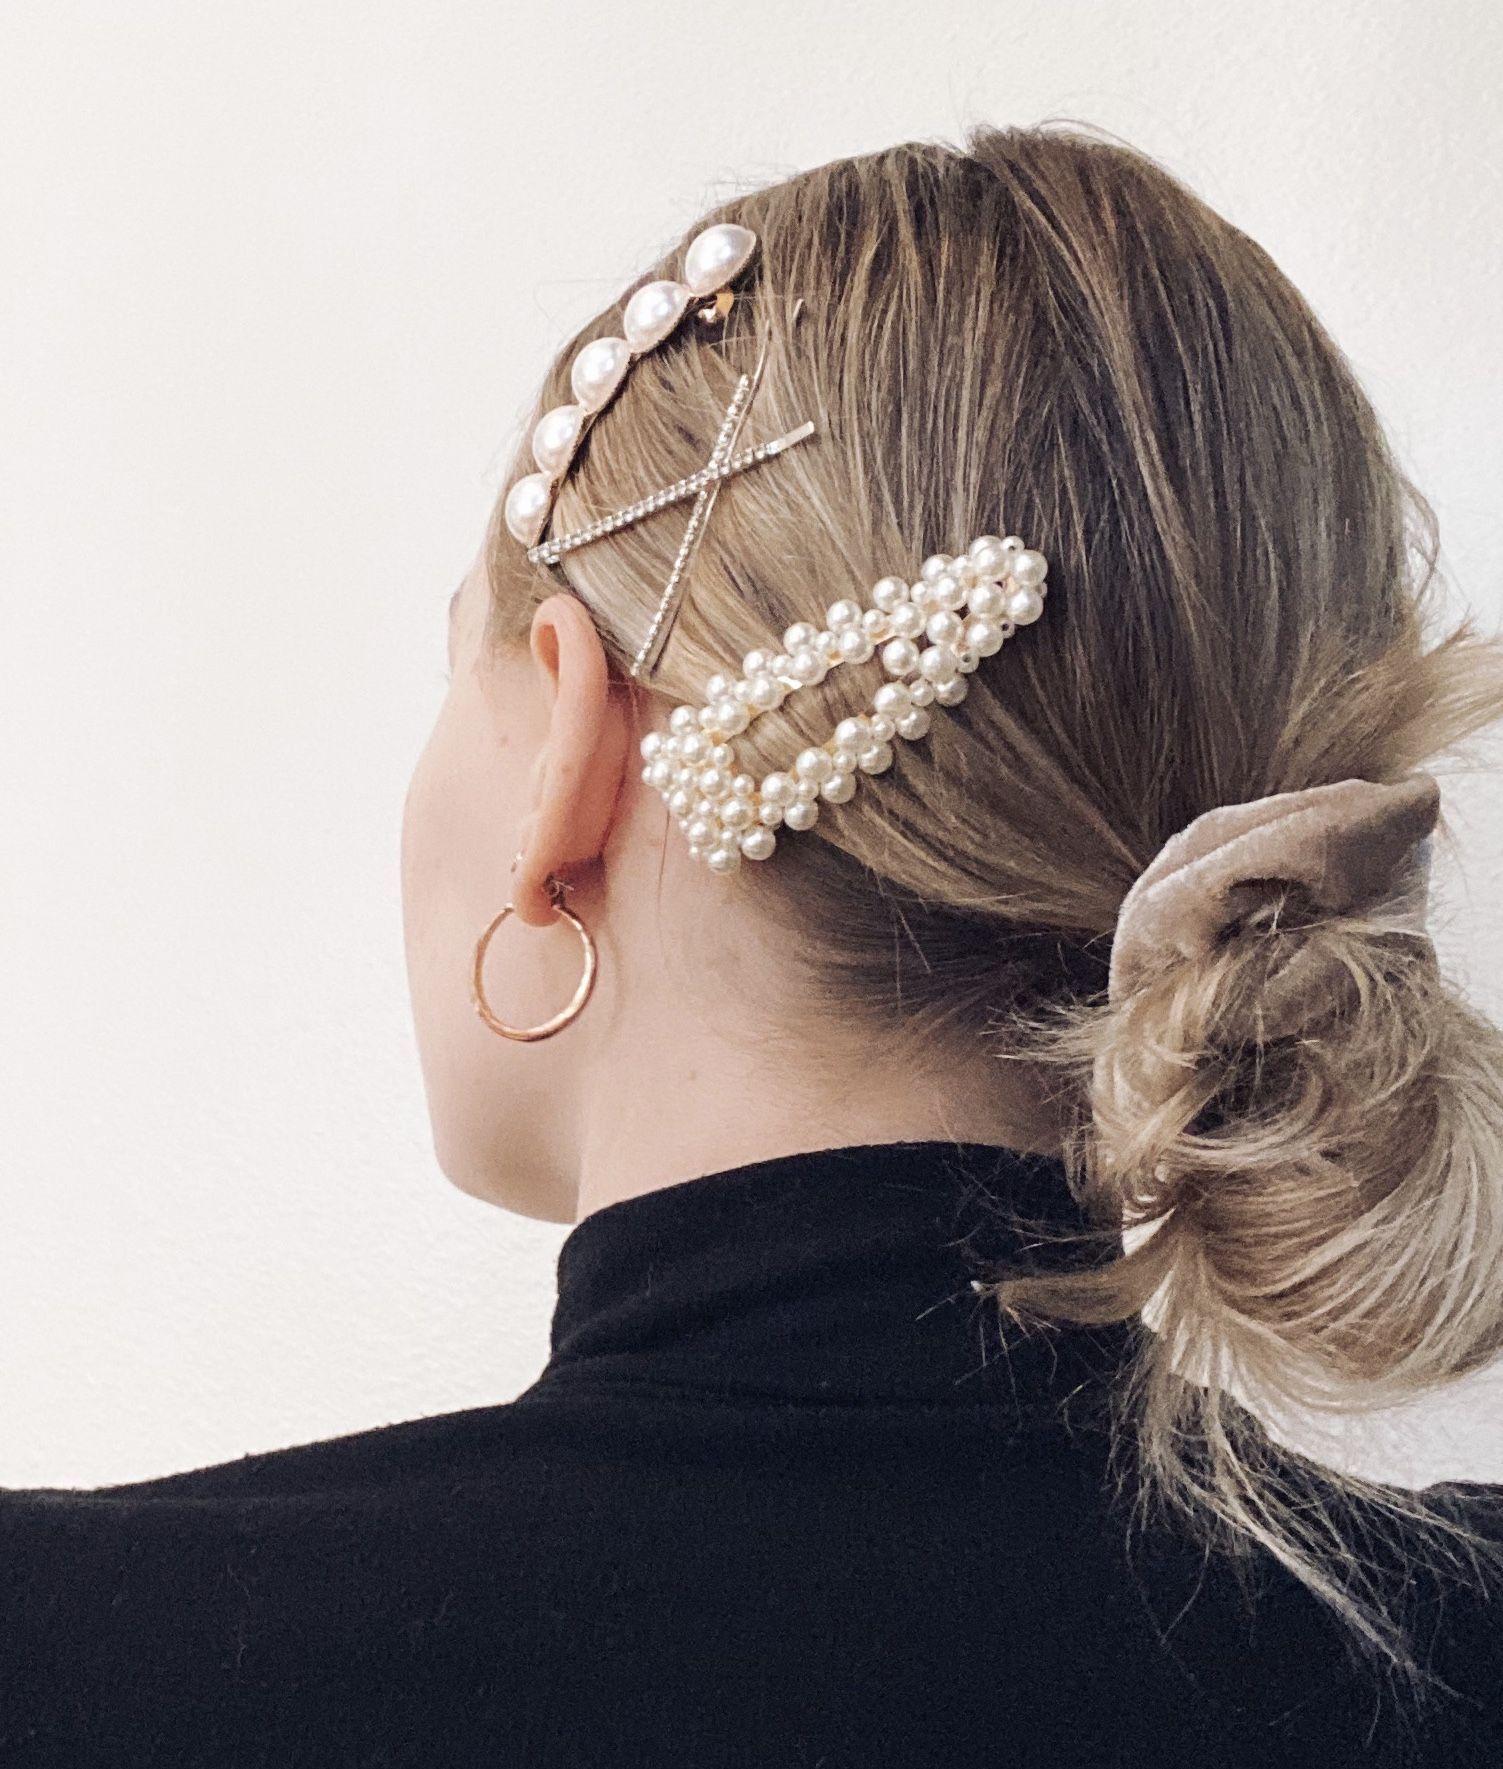 Pearl Clips Pearl Clips Hair Clip Aesthetic Hoops Gold Hoops Messy Bun Hair Aesthetic Haircl Gold Hair Accessories Gold Hair Clips Hair Clips Diy